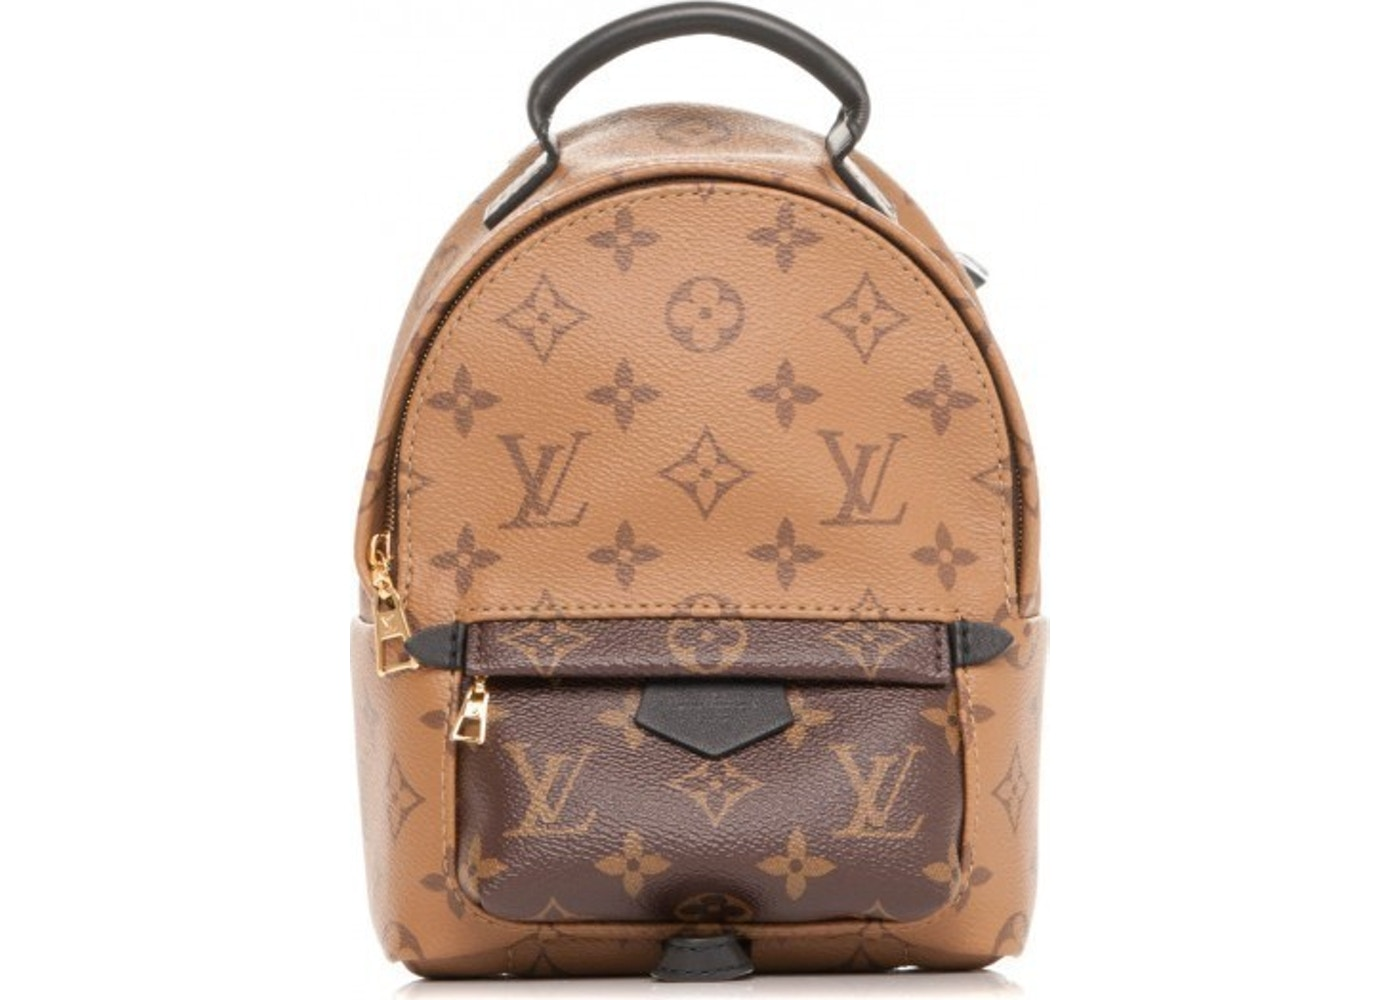 66808135c7a12 Louis Vuitton Palm Springs Reverse Monogram Mini Brown